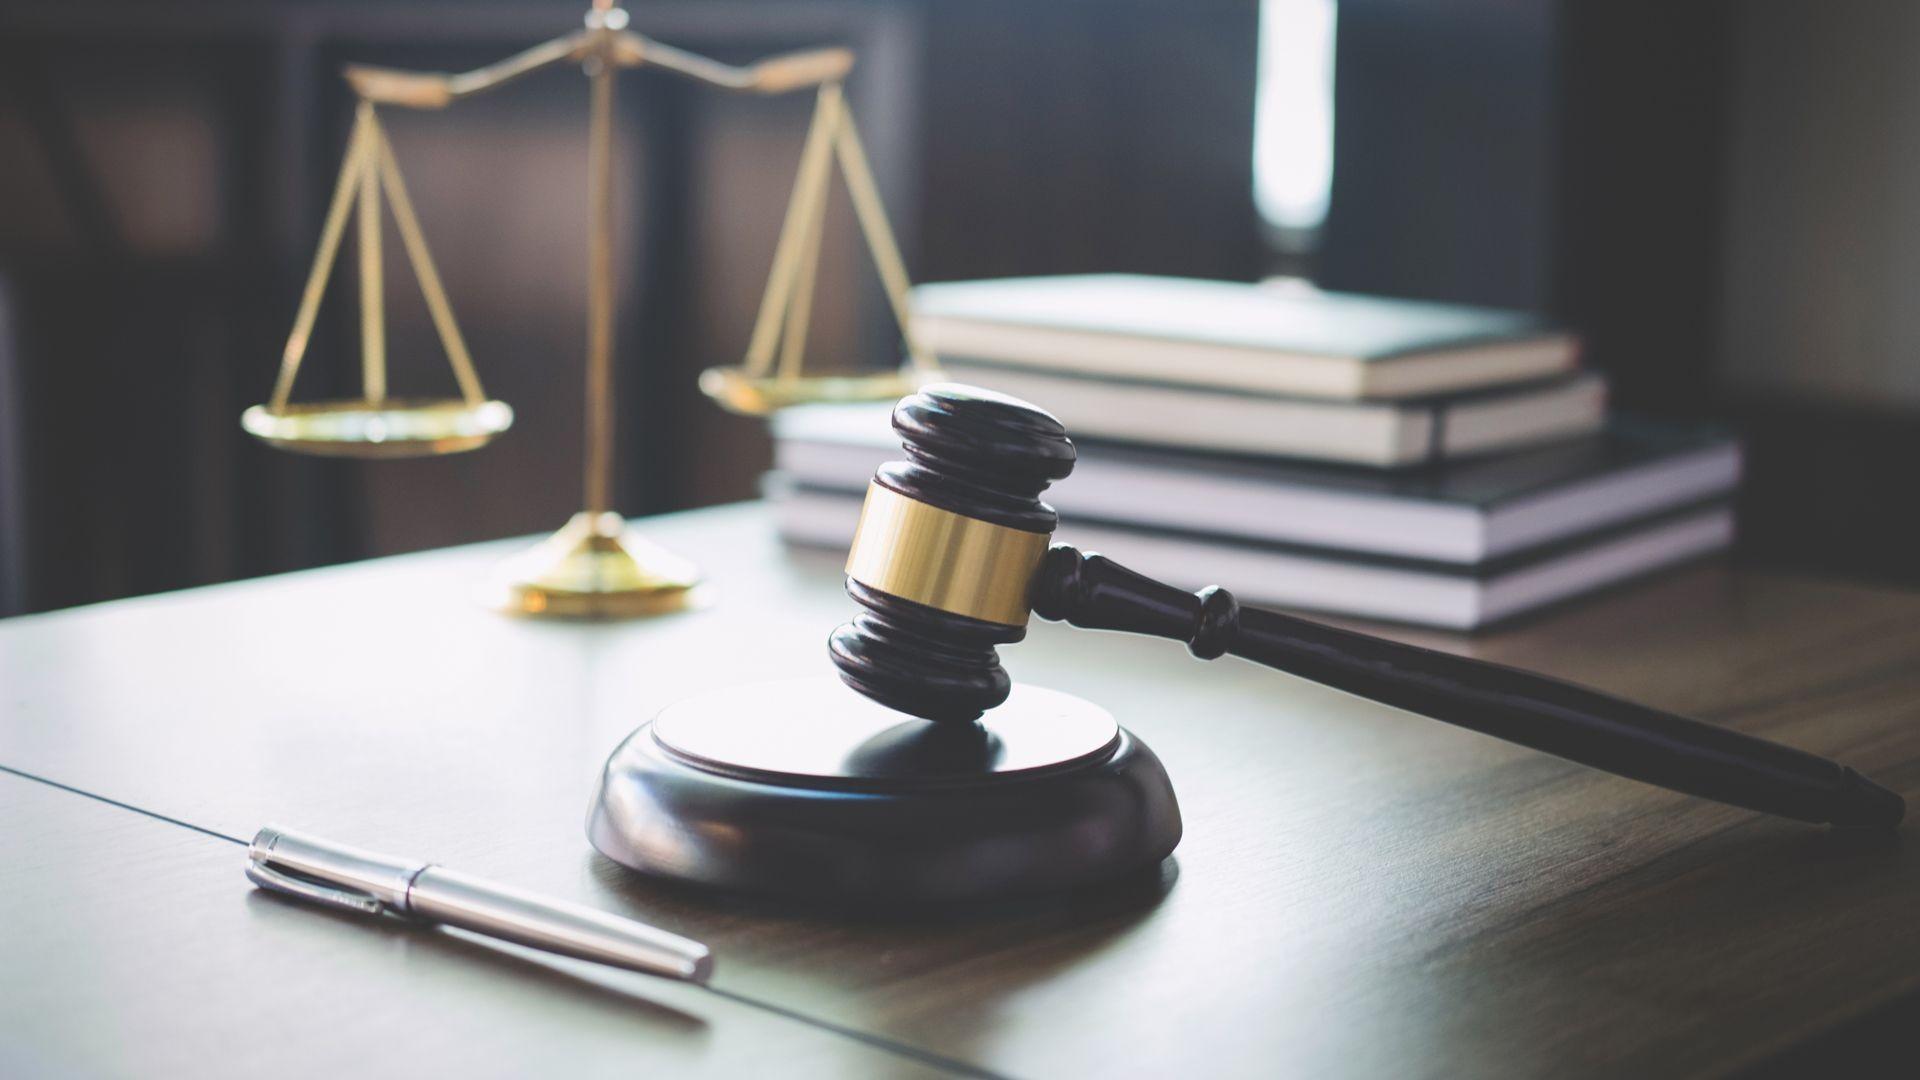 Despacho de abogados especializado en derecho de familia en Zaragoza